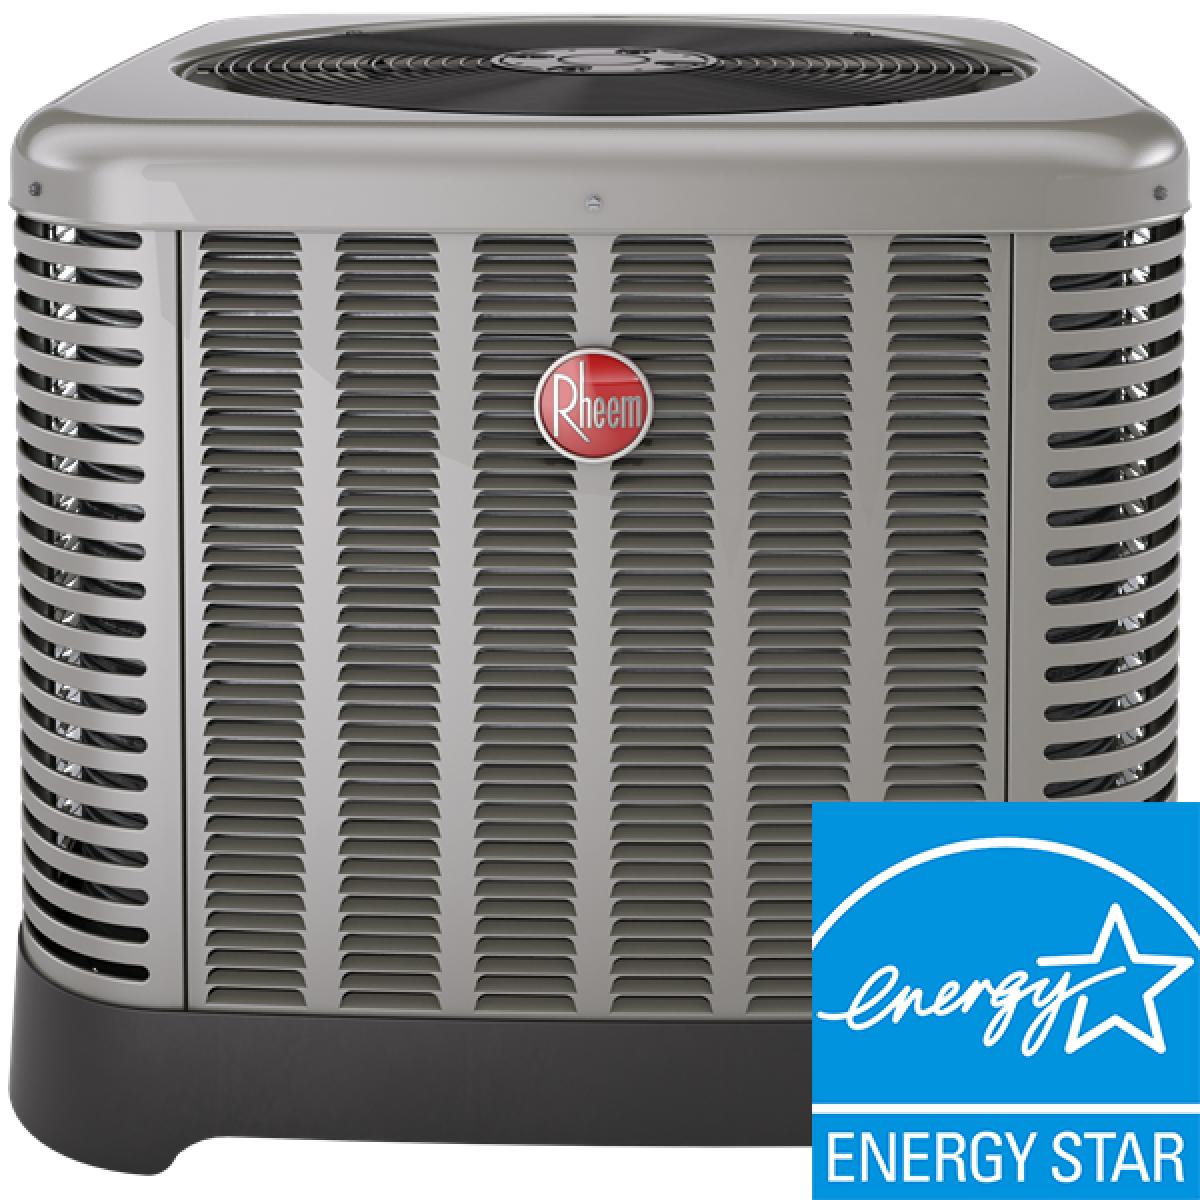 3 5 Ton Rheem 14 Seer Ra14 Classic 174 Series Air Conditioner